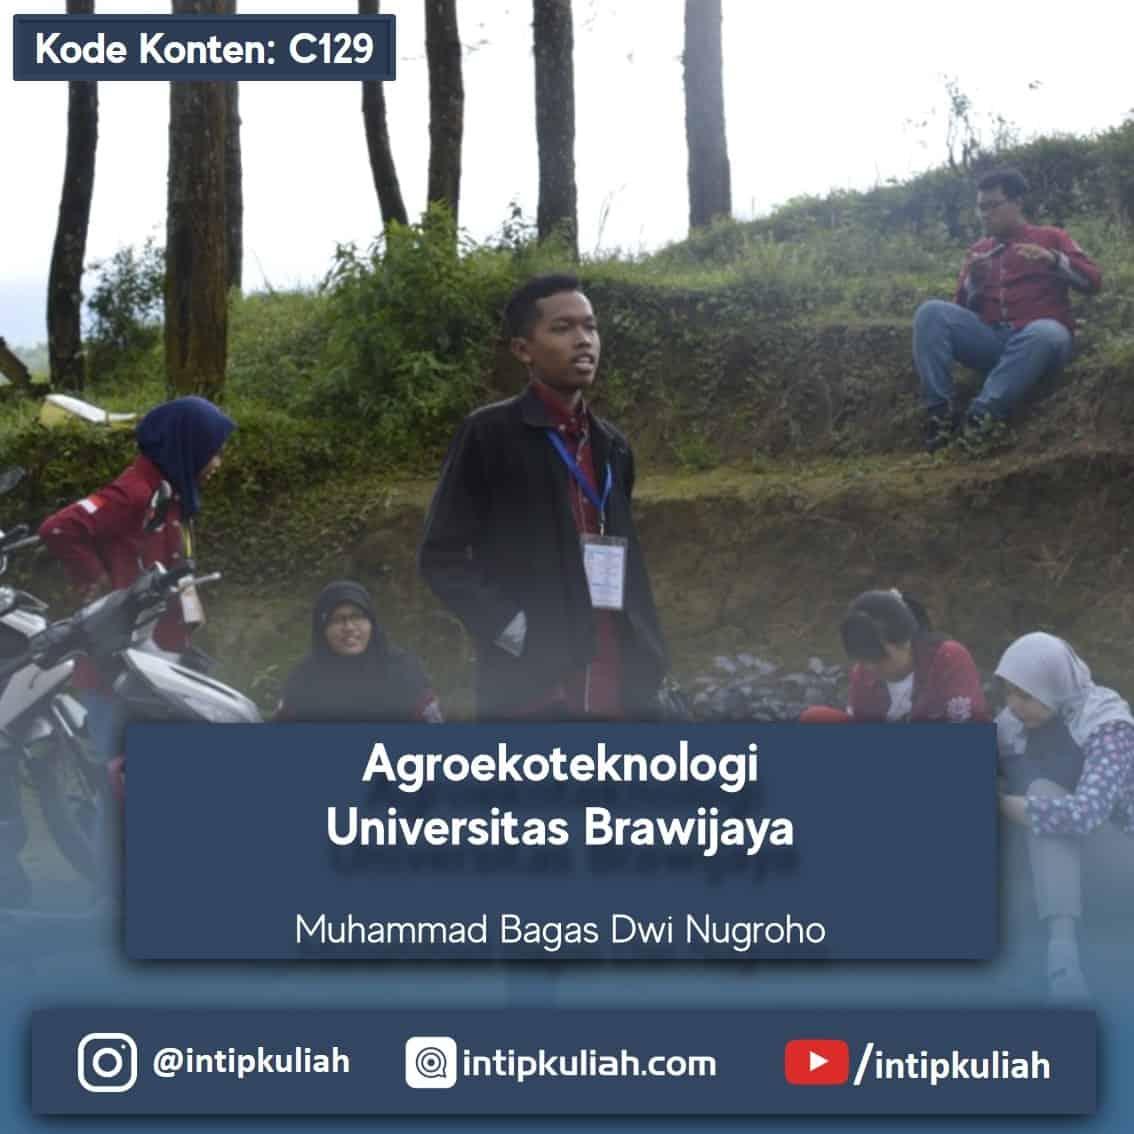 Agroekoteknologi Universitas Brawijaya (Bagas)